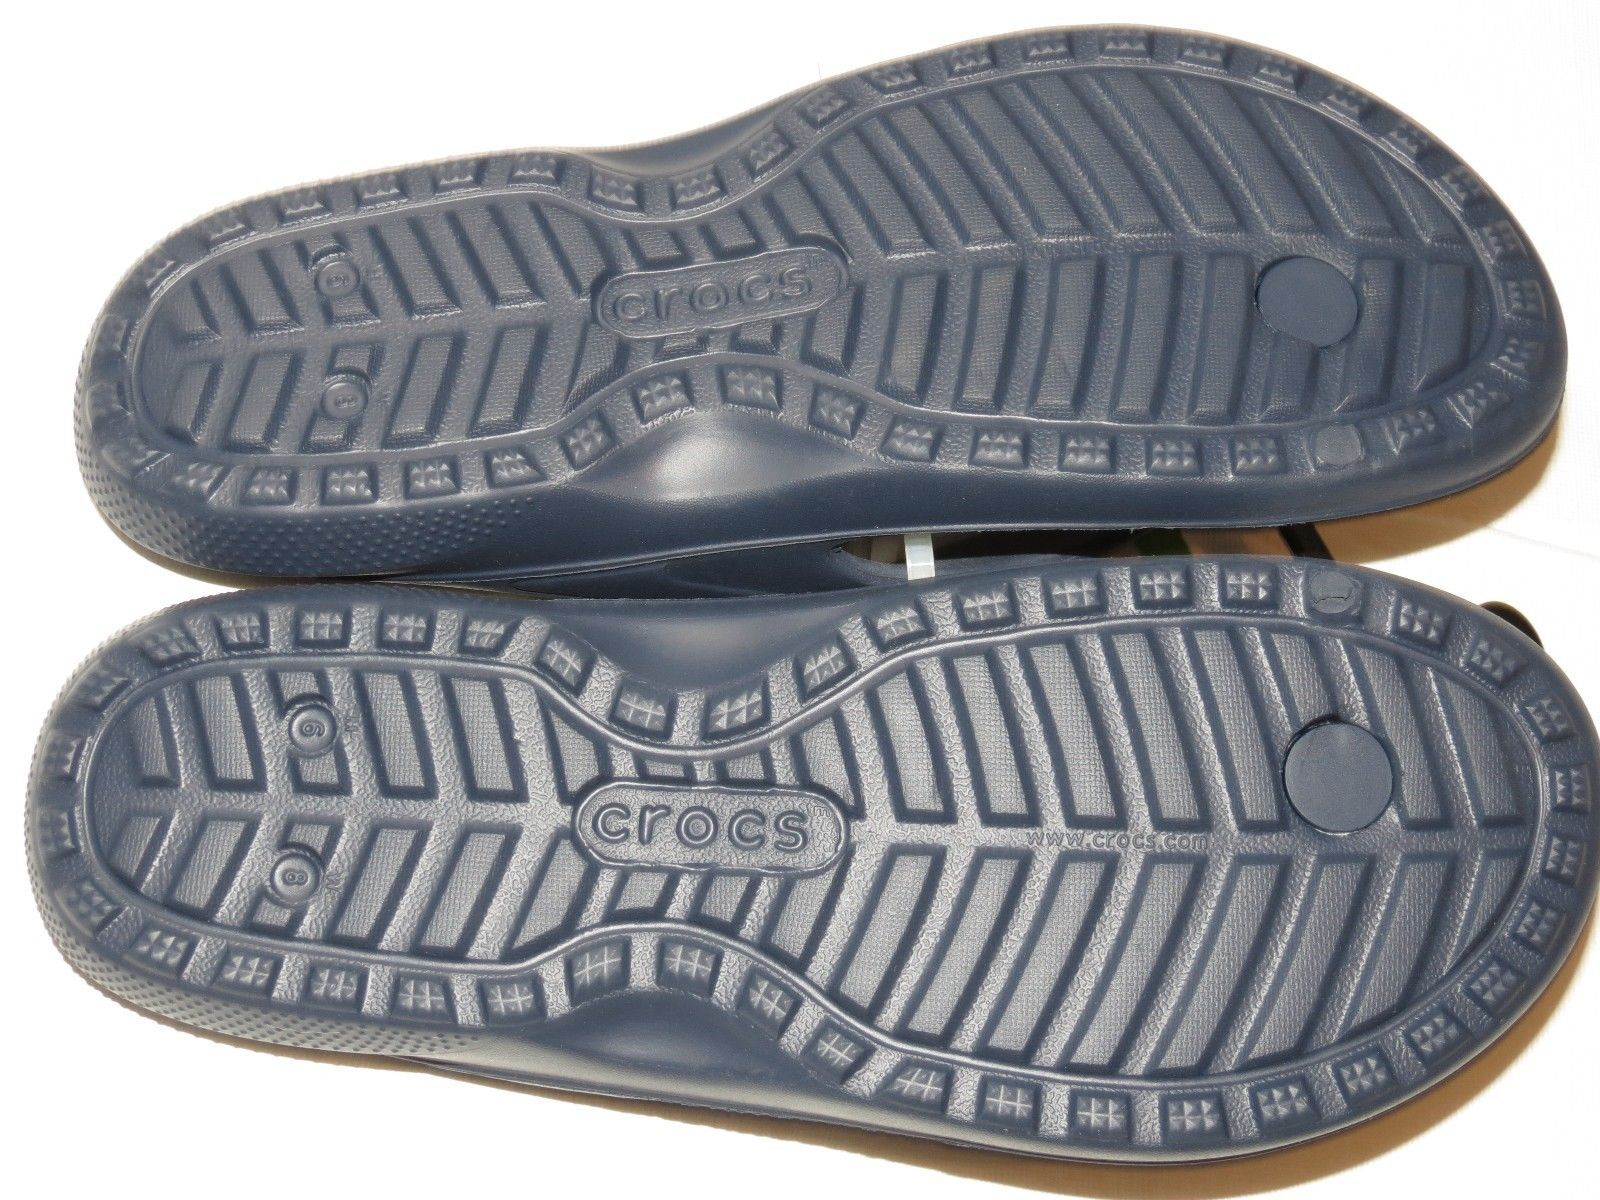 1ee379376 Crocs Classic Flip Navy Blue relaxed Unisex M 6 W 8 flip flops sandals  202635